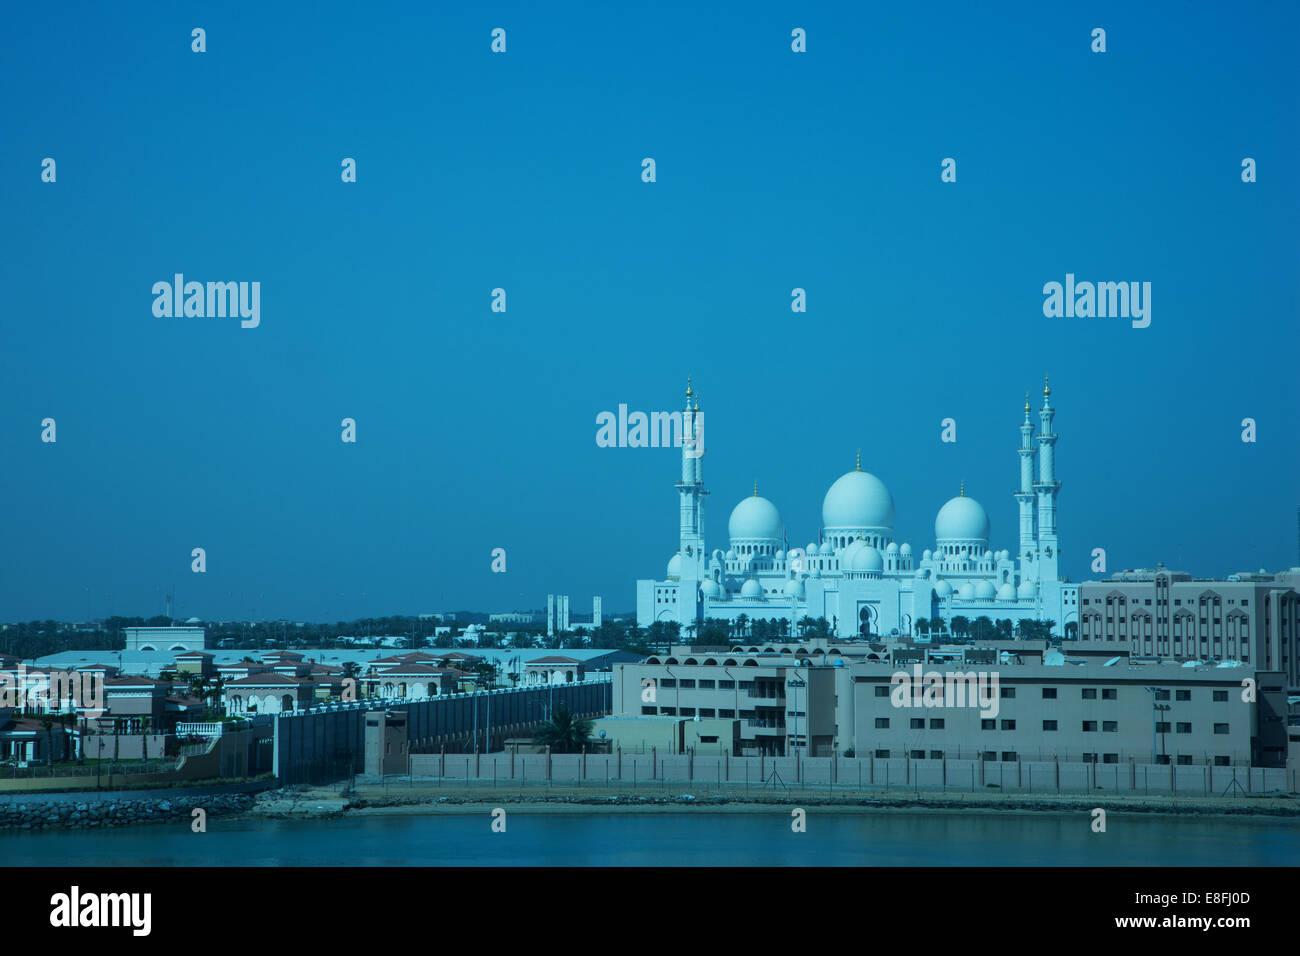 United Arab Emirates, Abu Dhab, Al Hosn, Sheikh Zayed Mosque - Stock Image